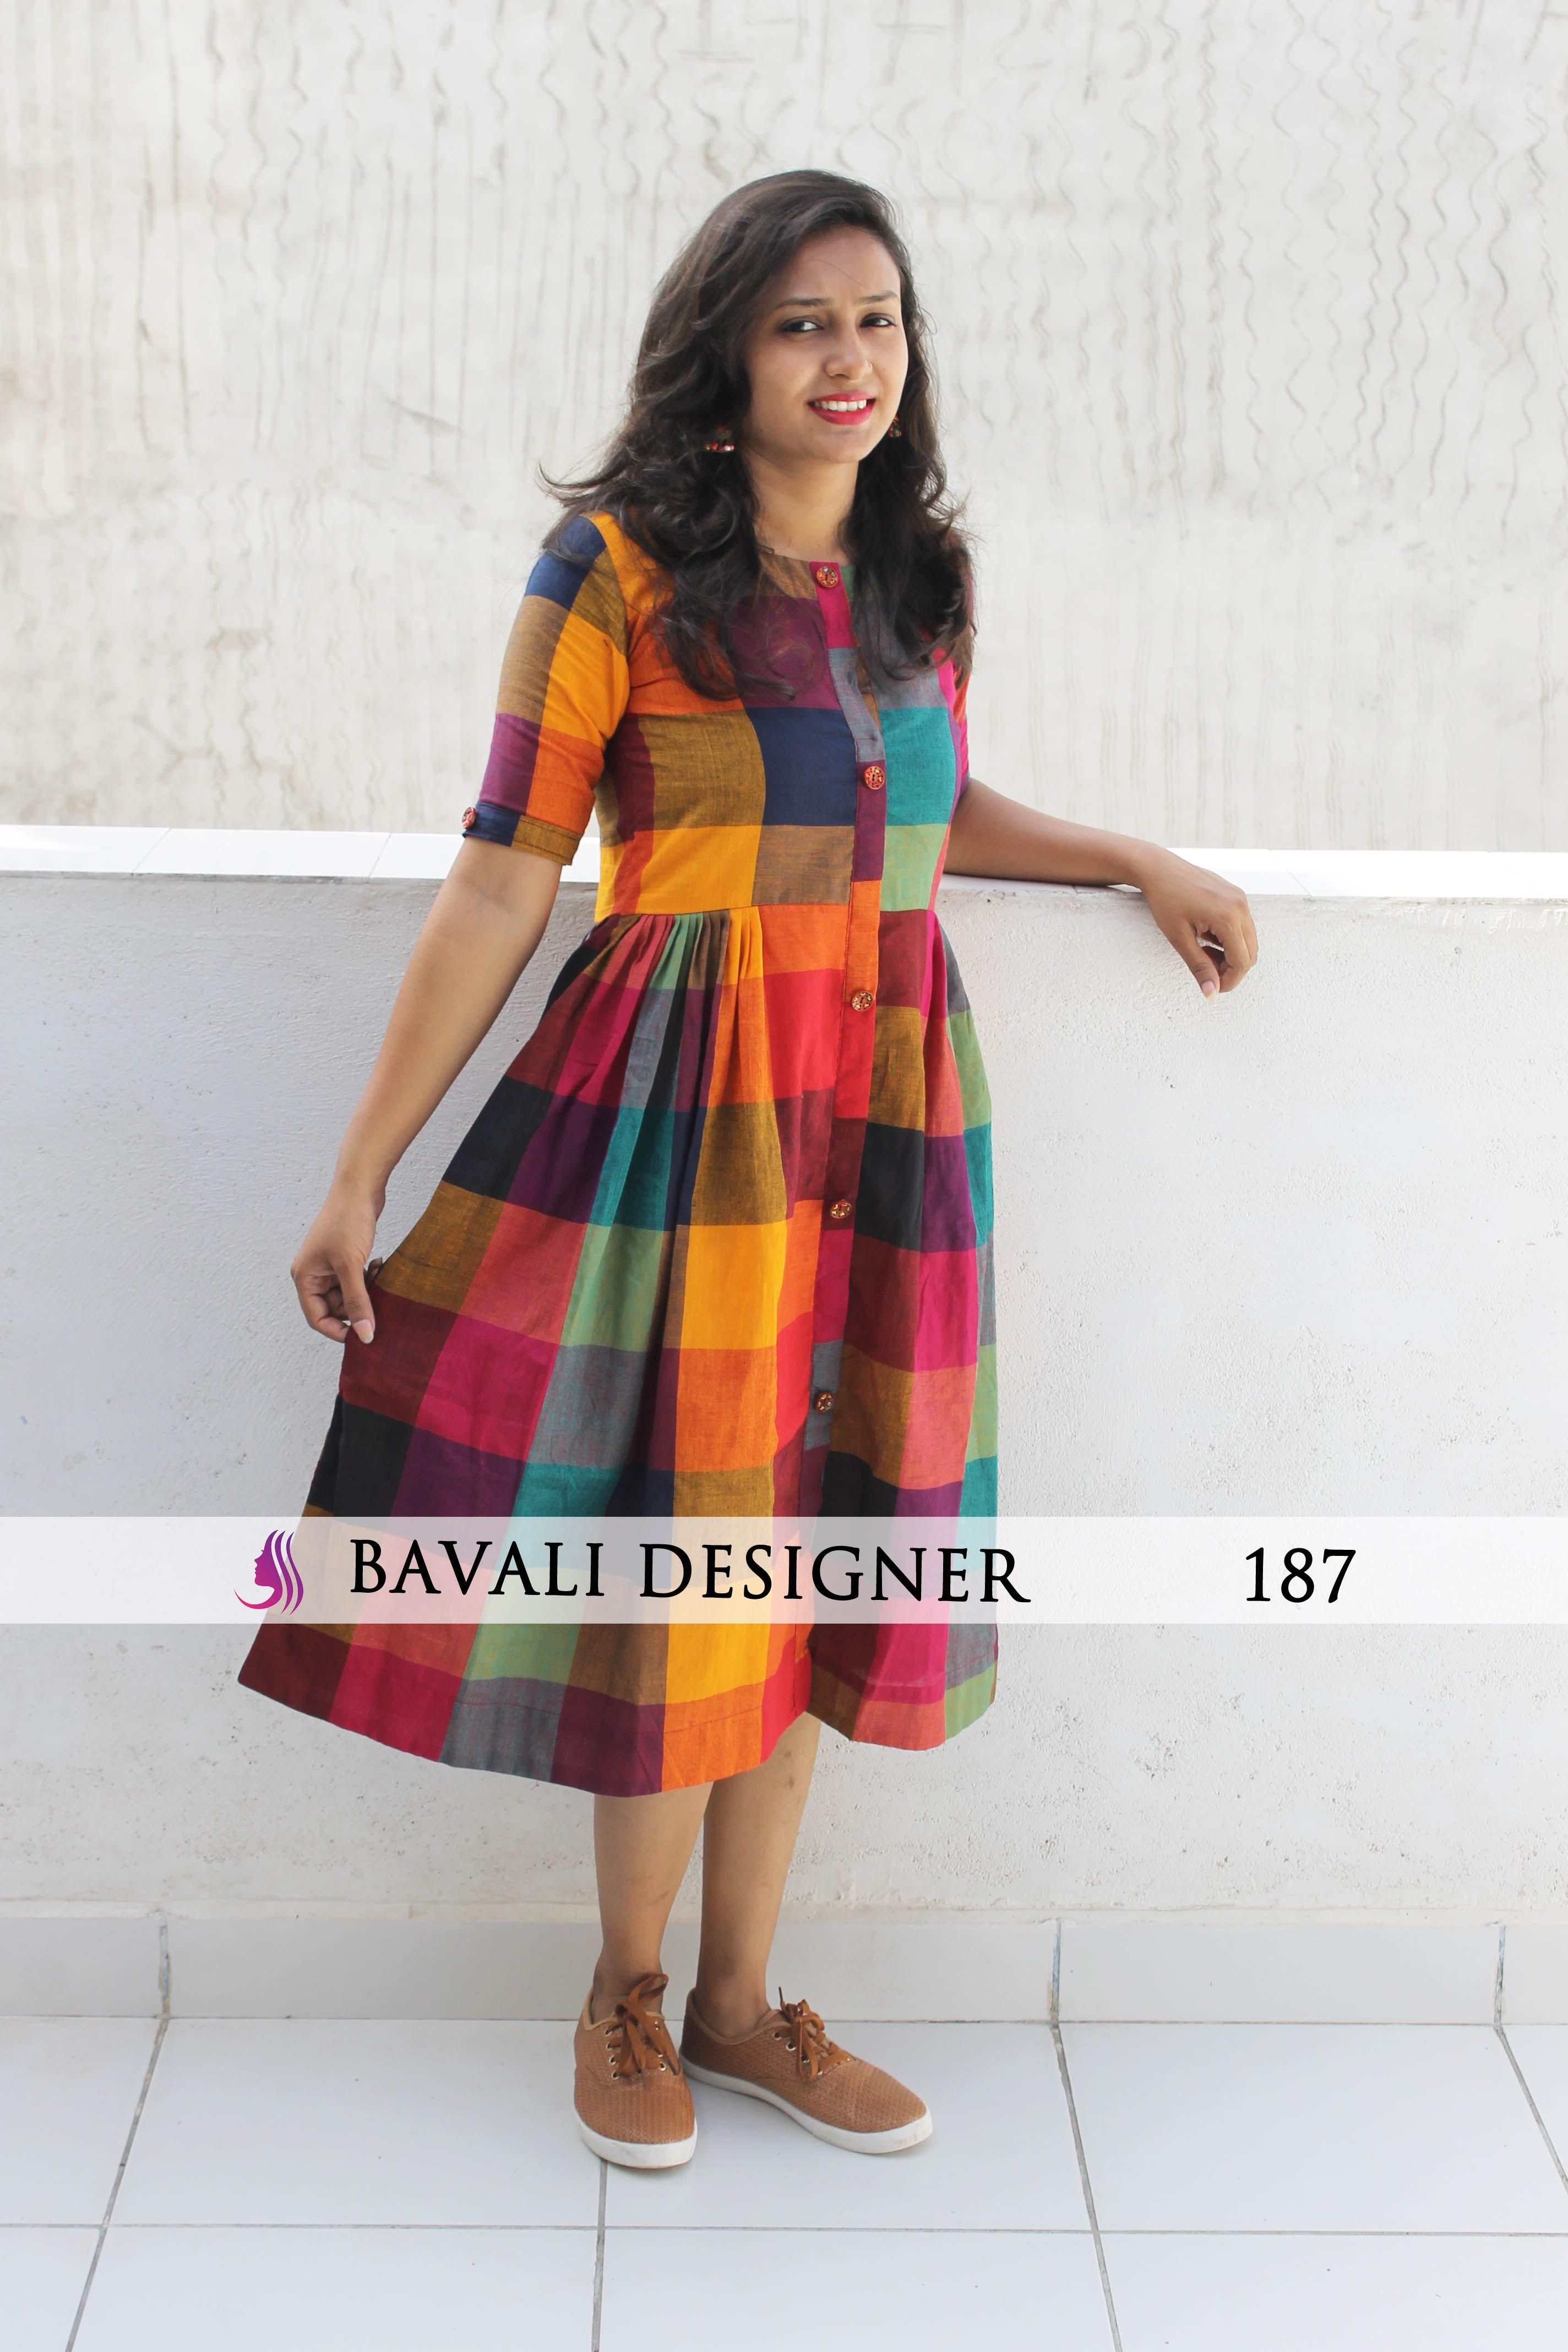 ea27ebadda86 Buy Latest Designer Kurtis Online at Bavali Designer